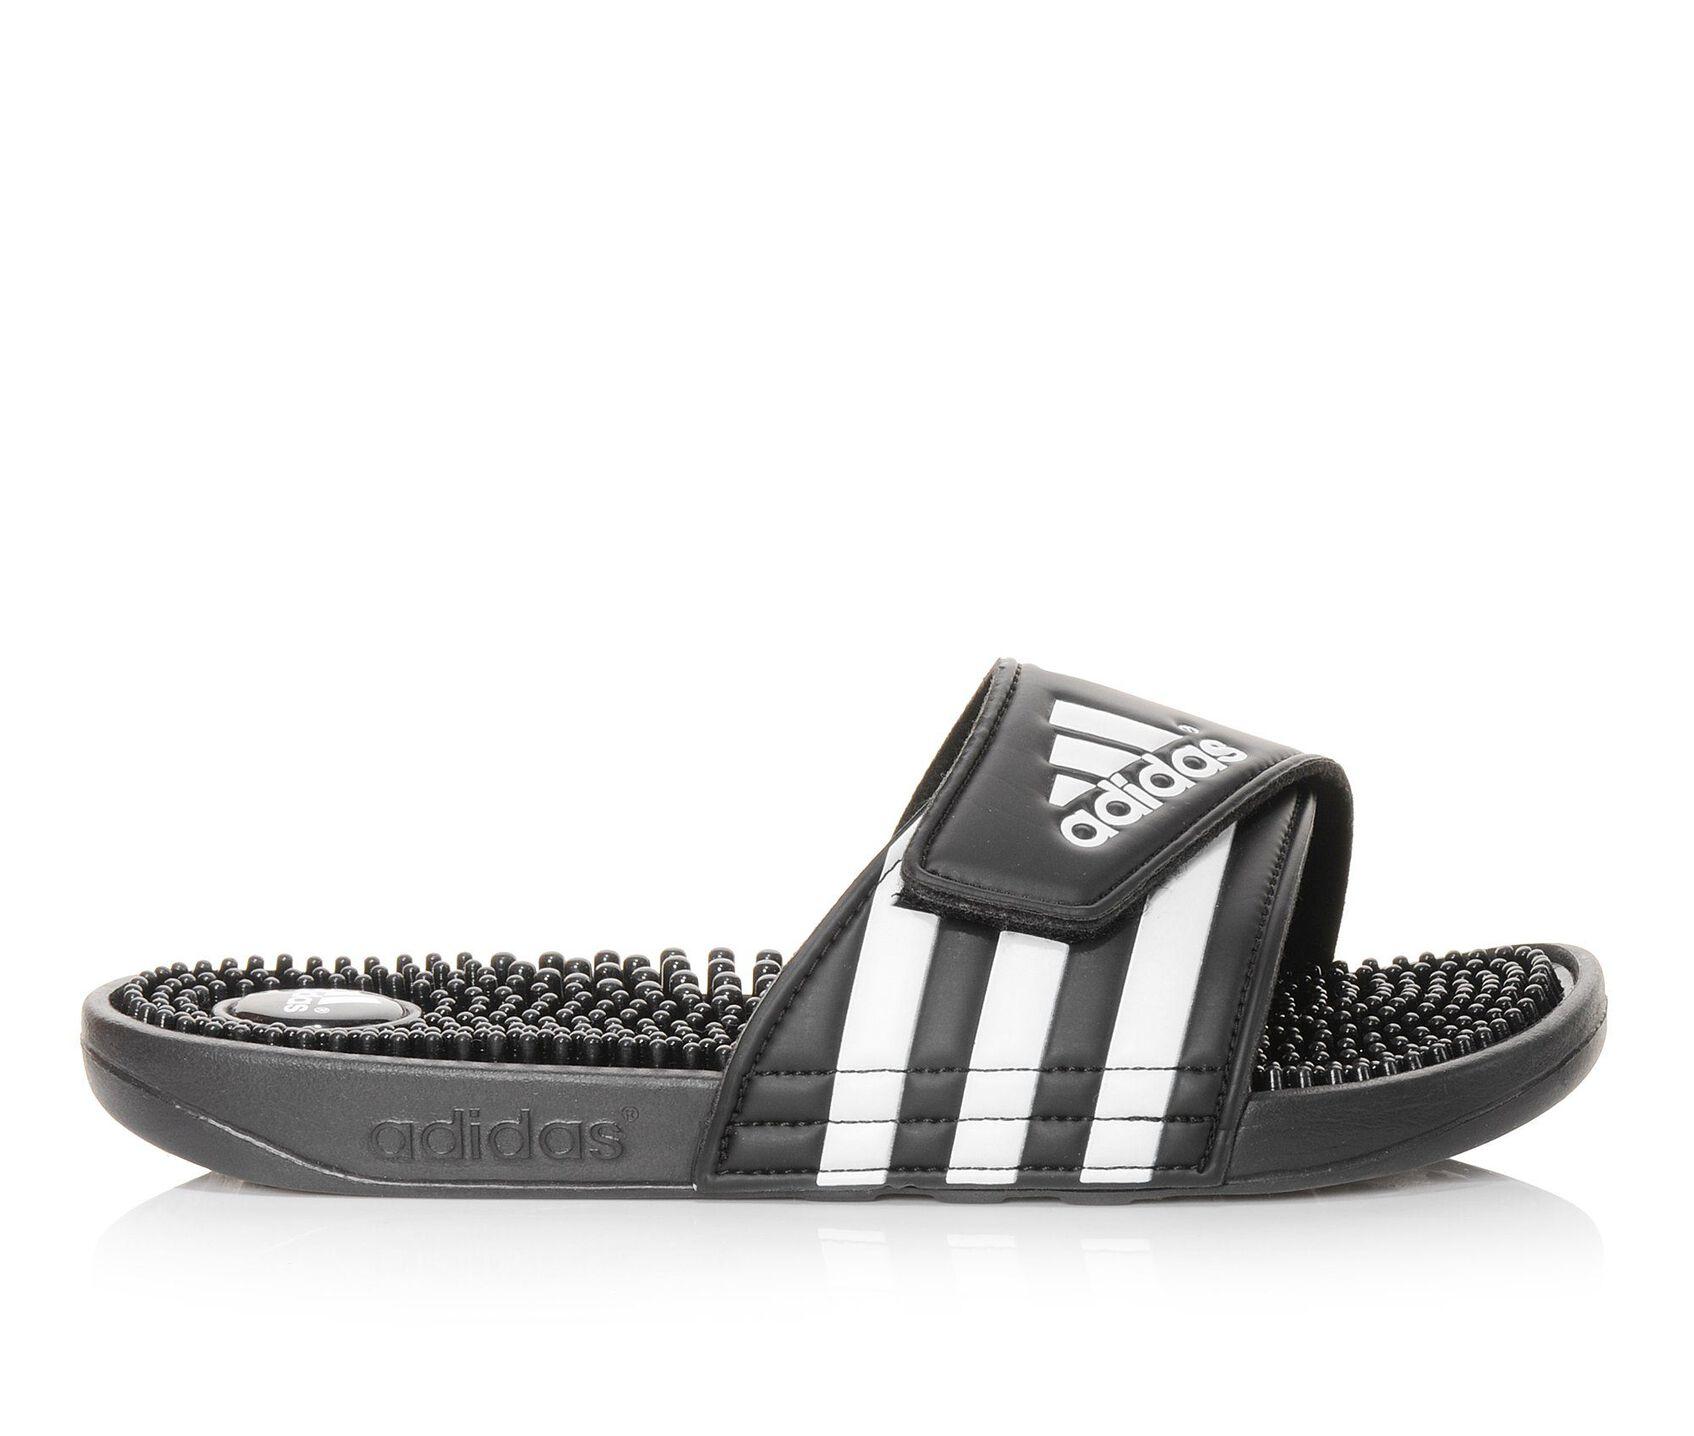 930c15f74 Images. Women  39 s Adidas Adissage Sport Slides